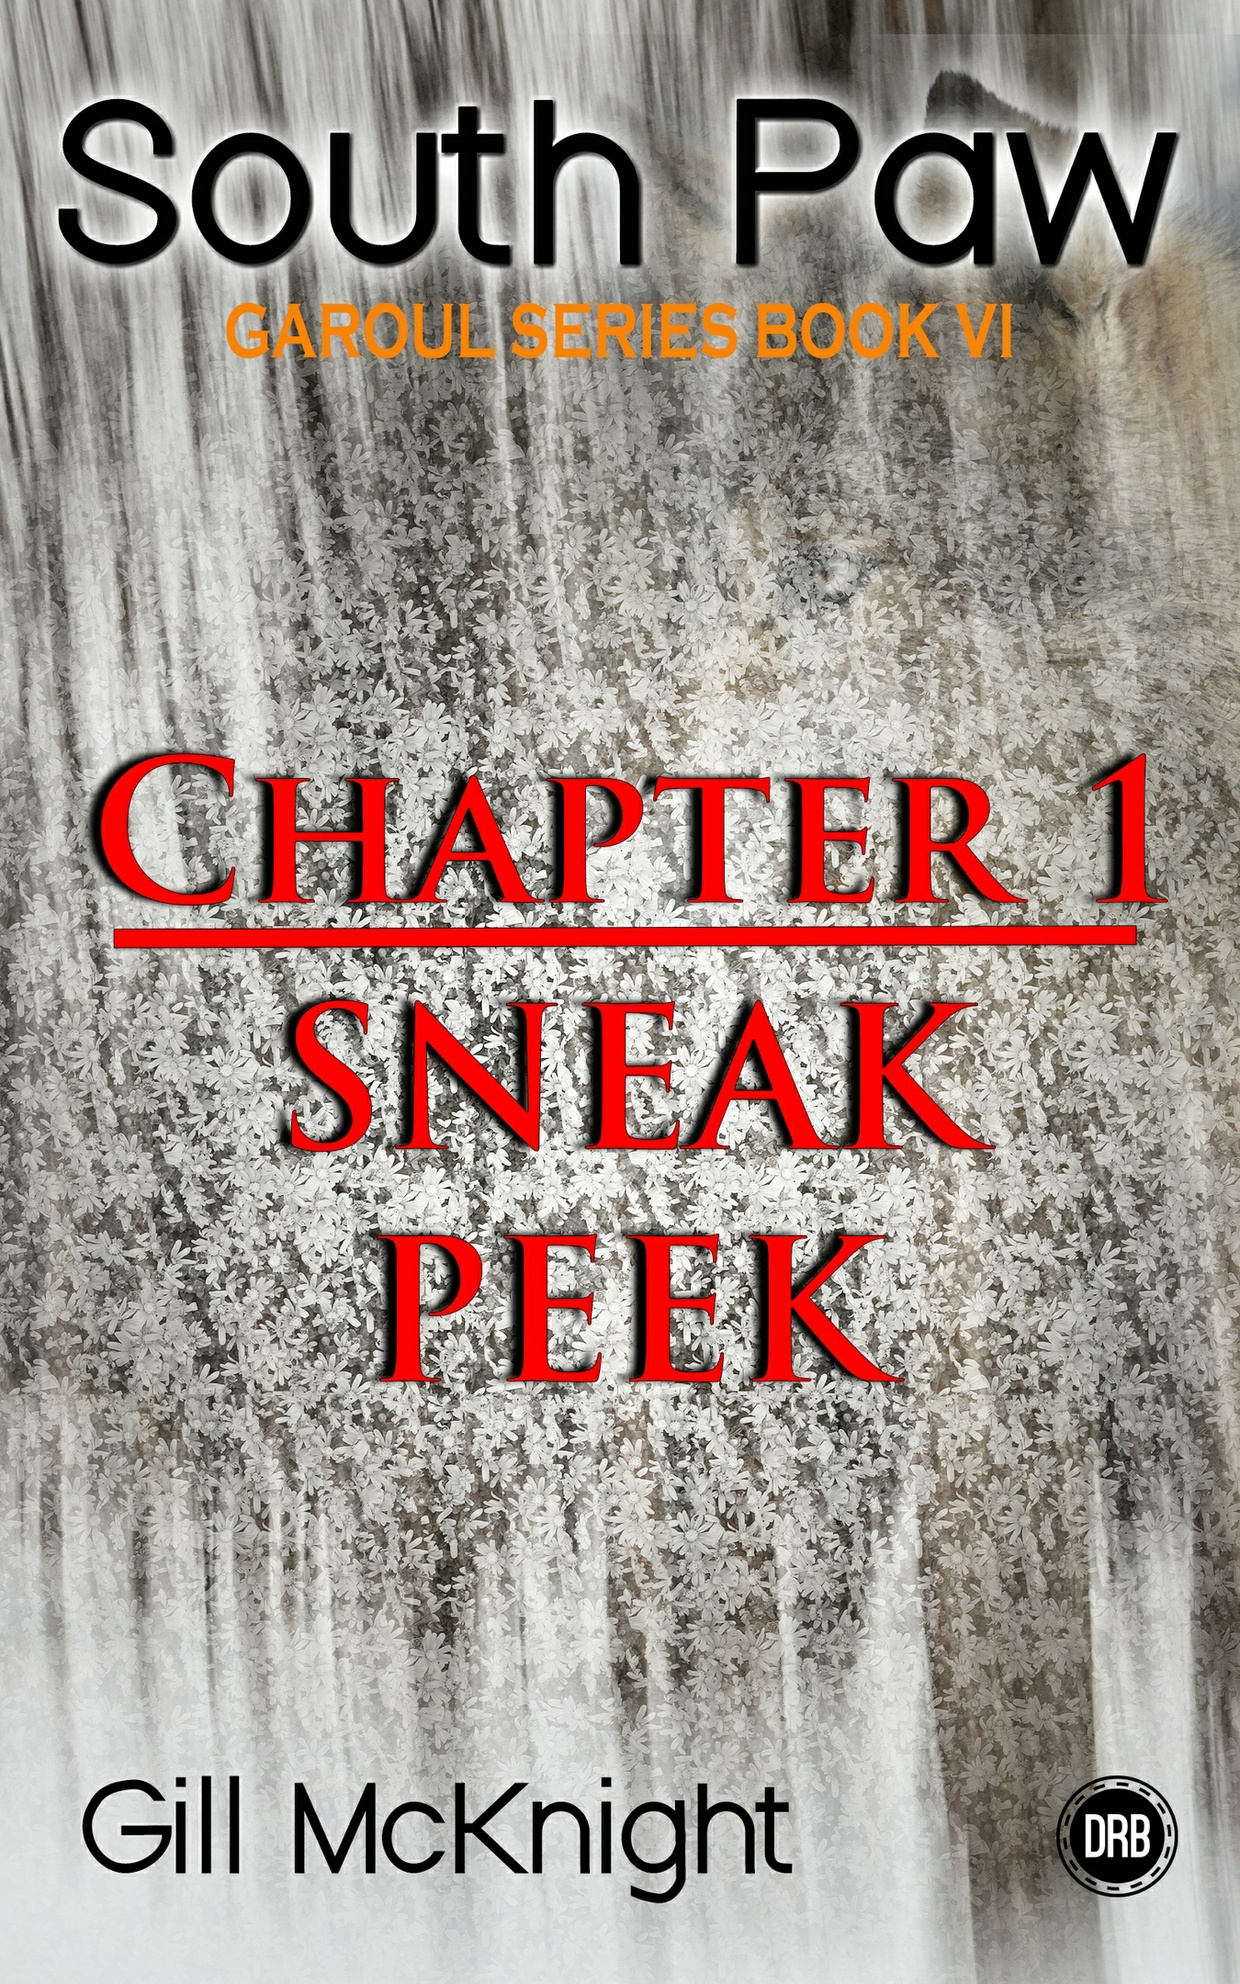 South Paw by Gill McKnight - Sneak Peek of Chapter 1 (epub)